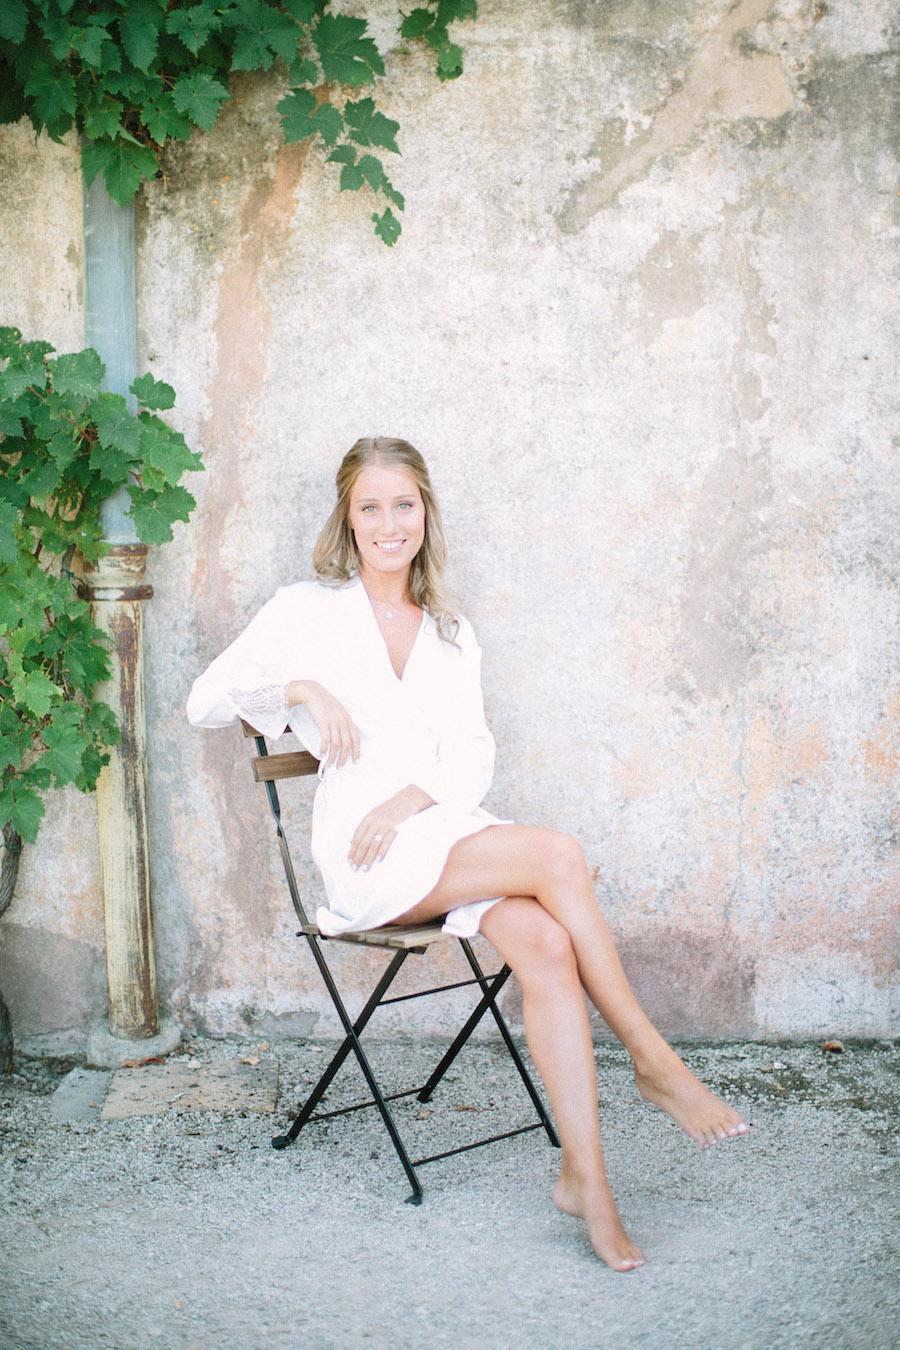 saya-photography-wedding-french-riviera-rustic-antibes-la-bastide-du-roy-48.jpg